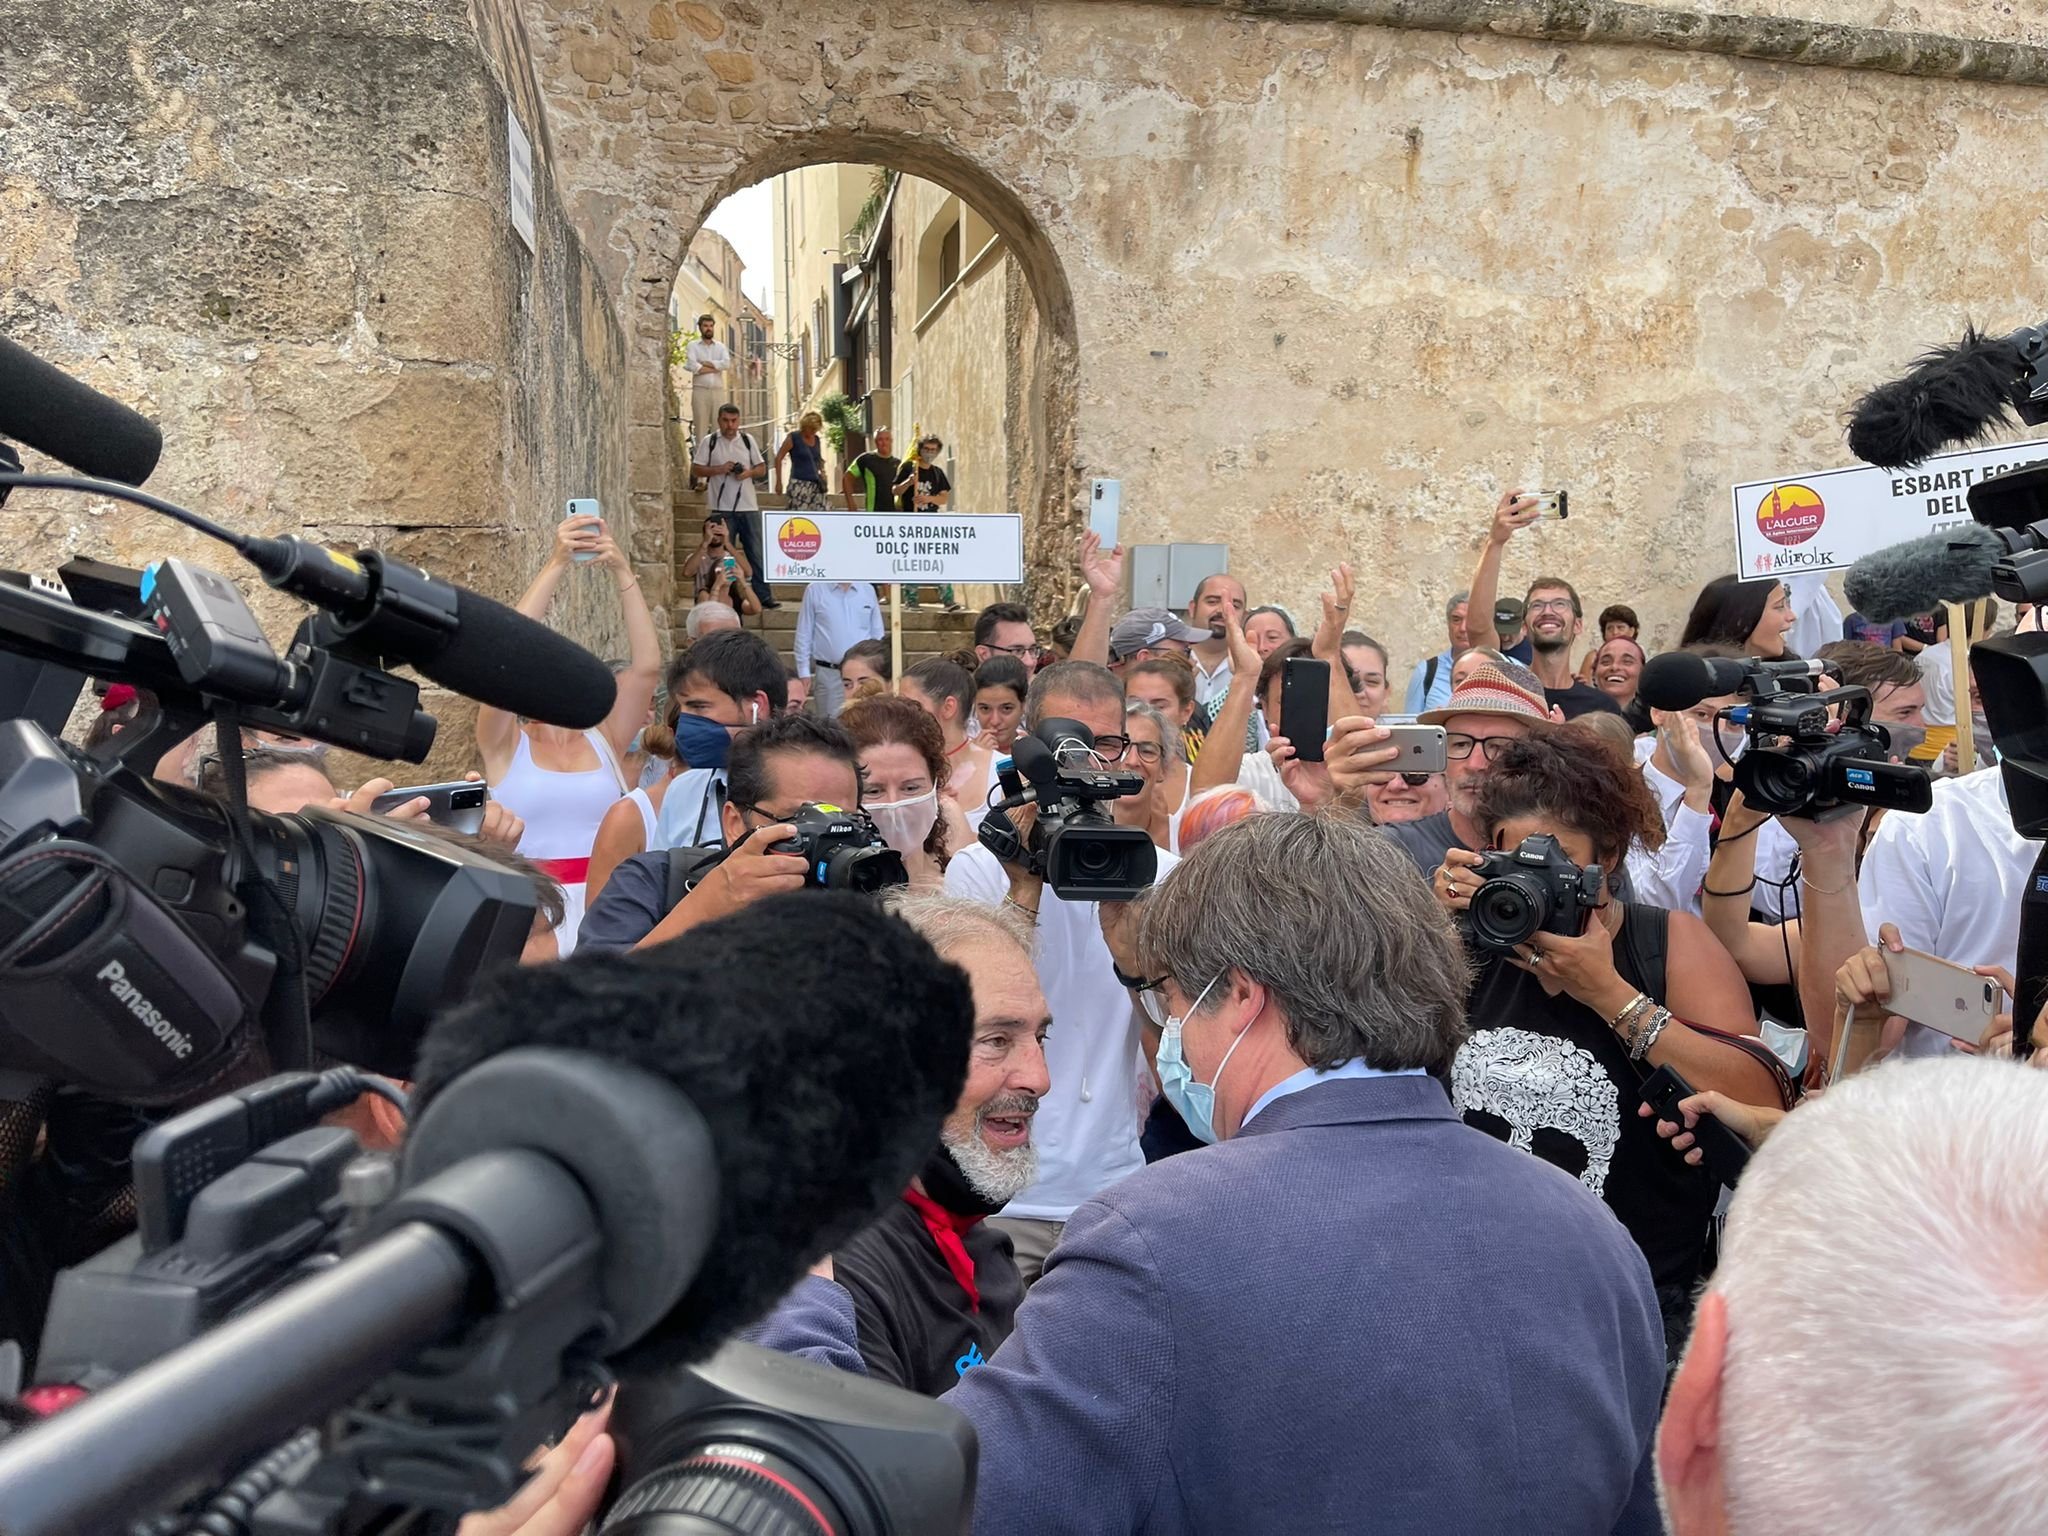 Bany de masses de Puigdemont a l'Alguer | Quico Sallés